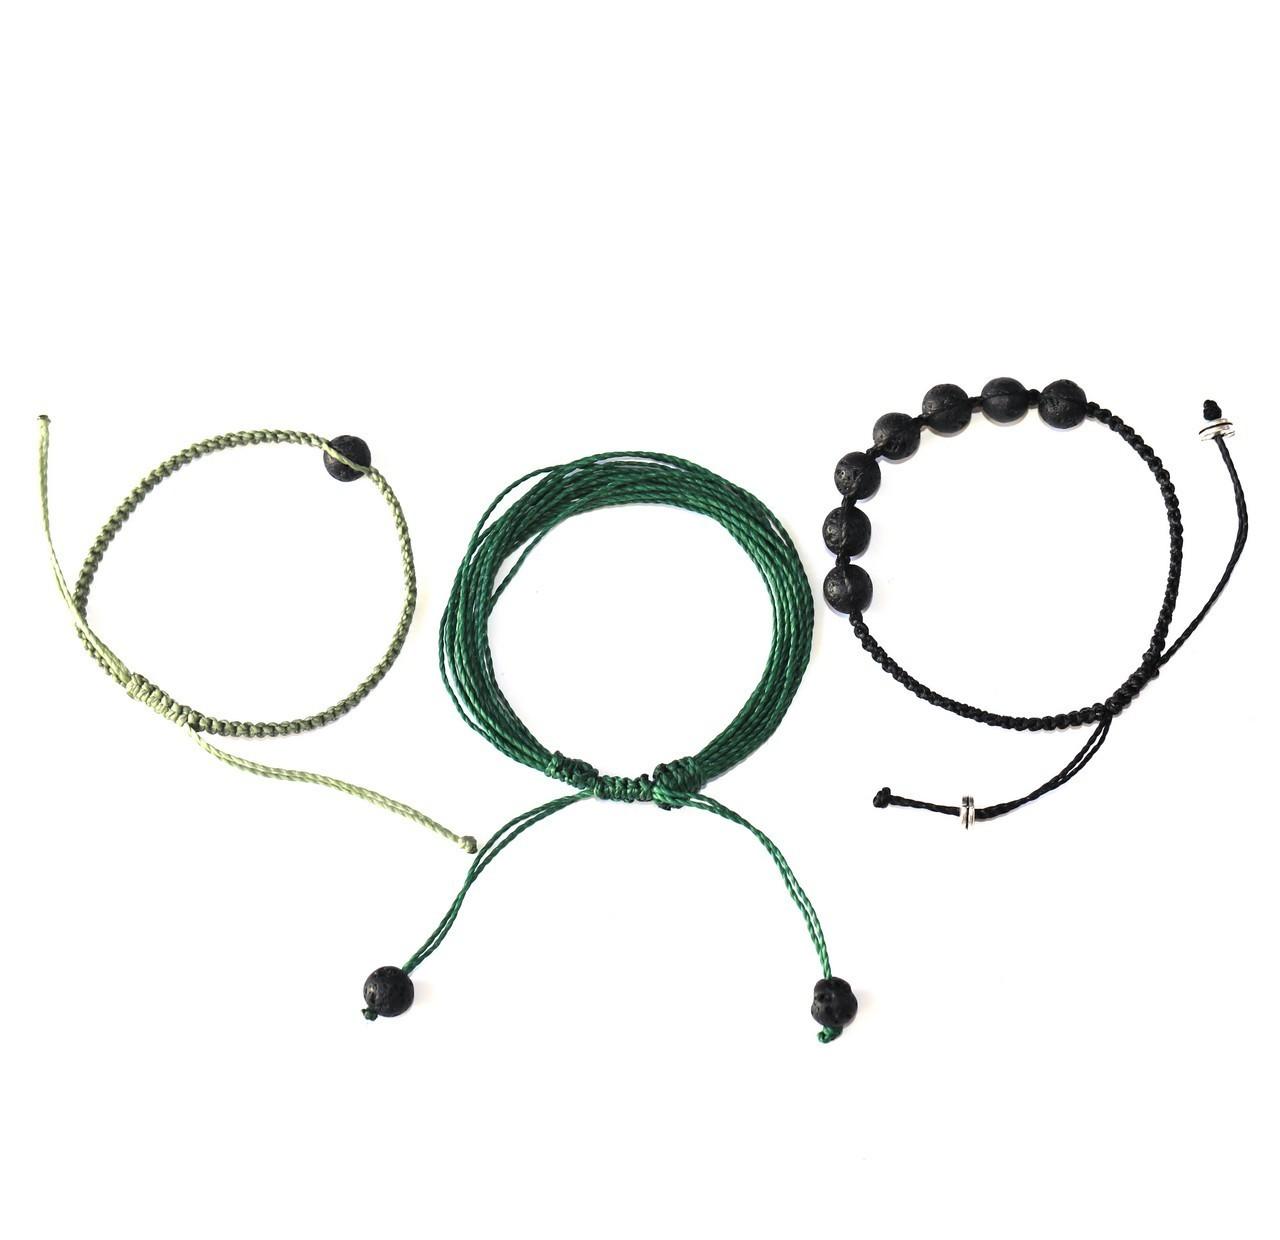 Seal Mode Diffuser Bracelets